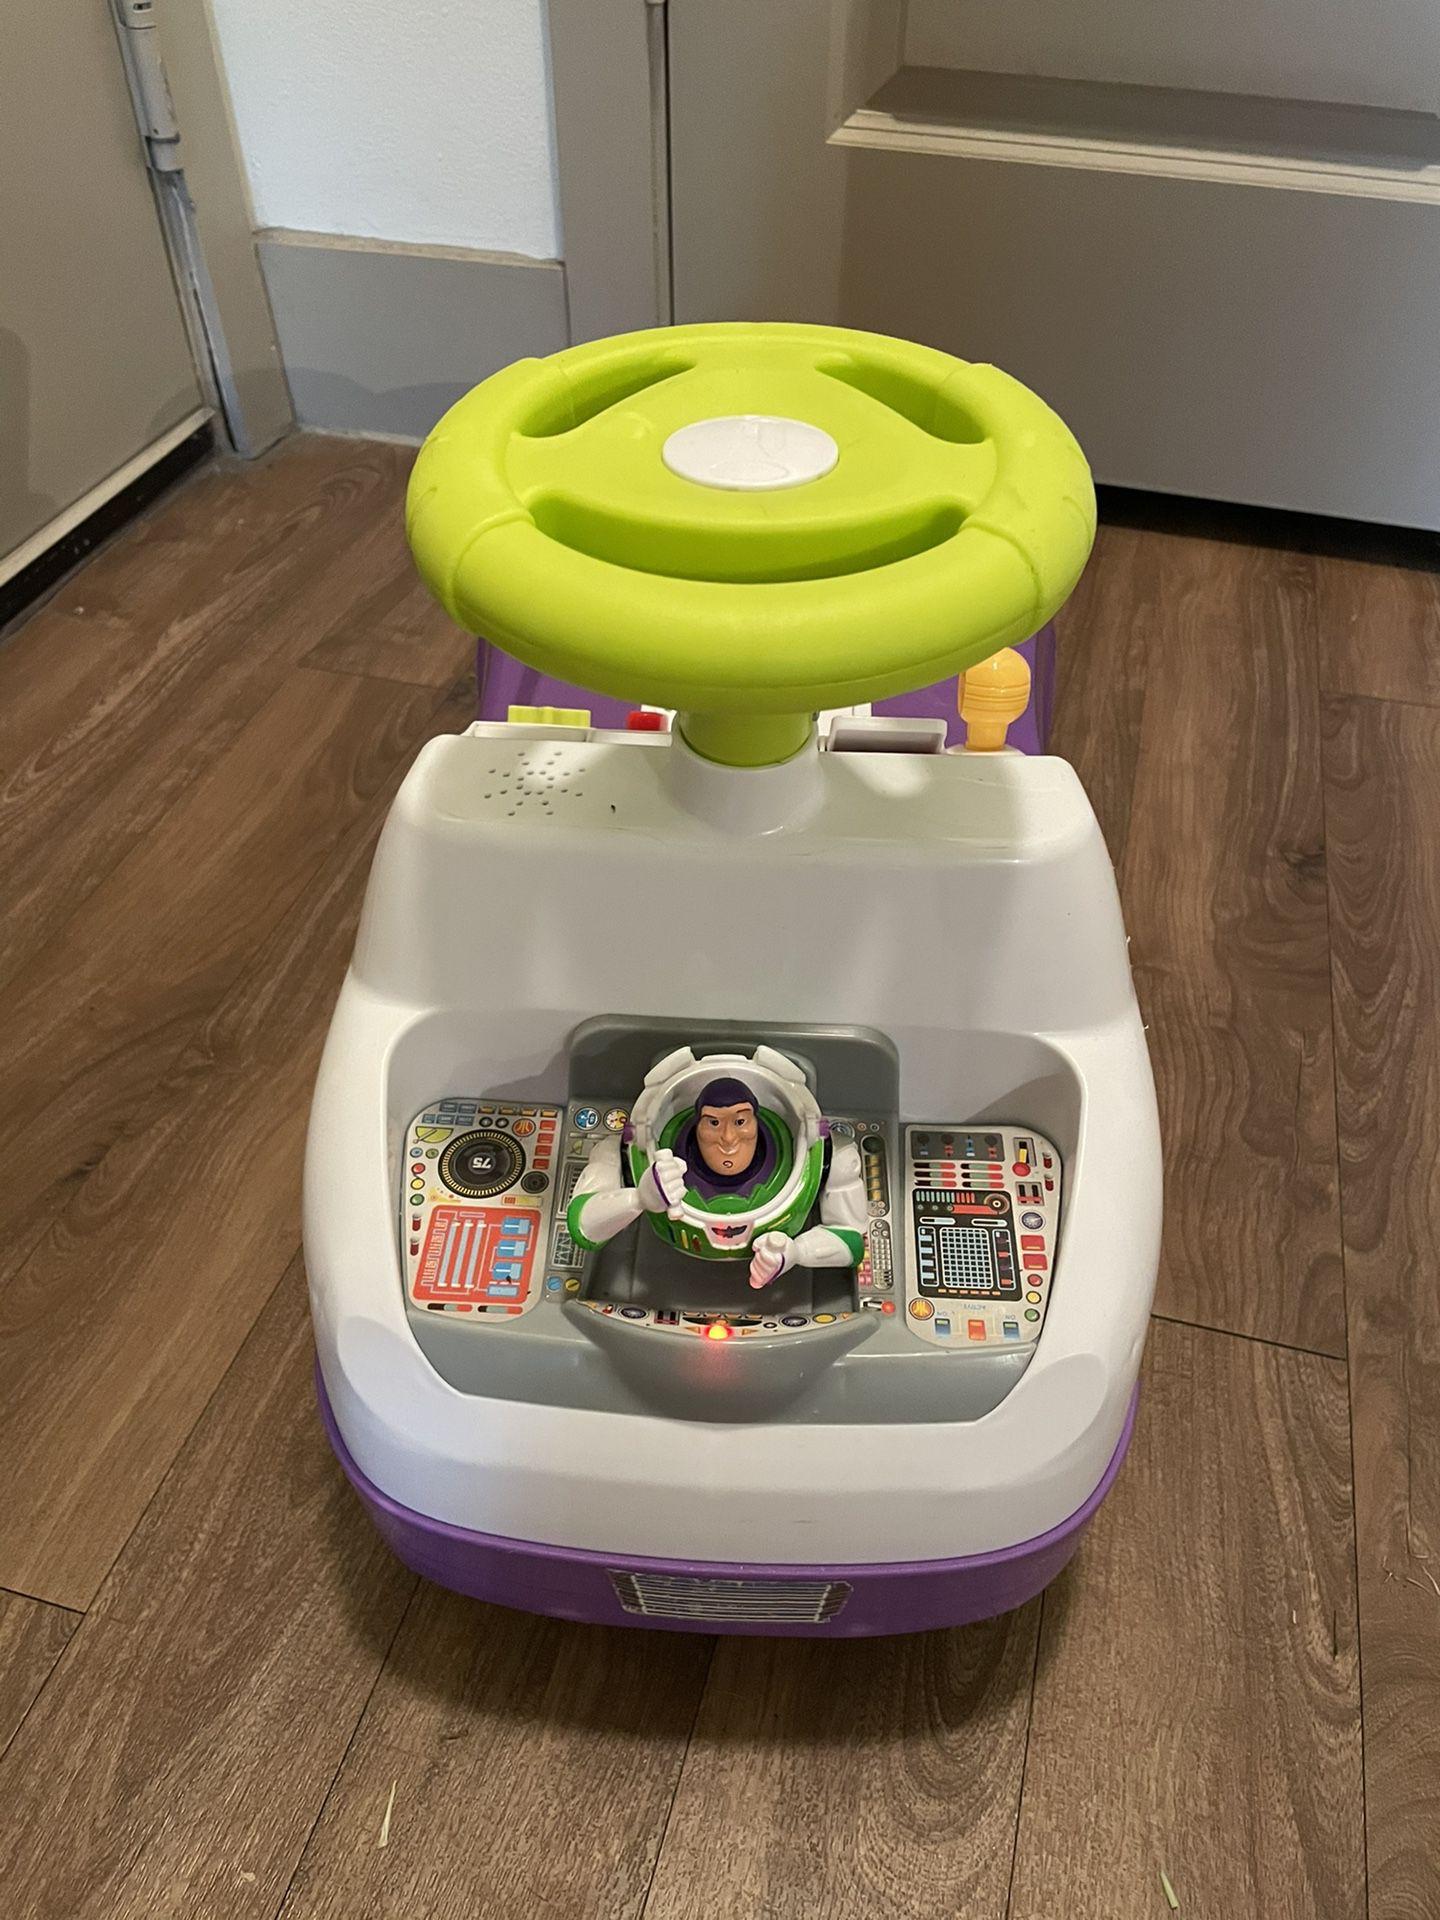 Buzz Lightyear Toddler Ride On